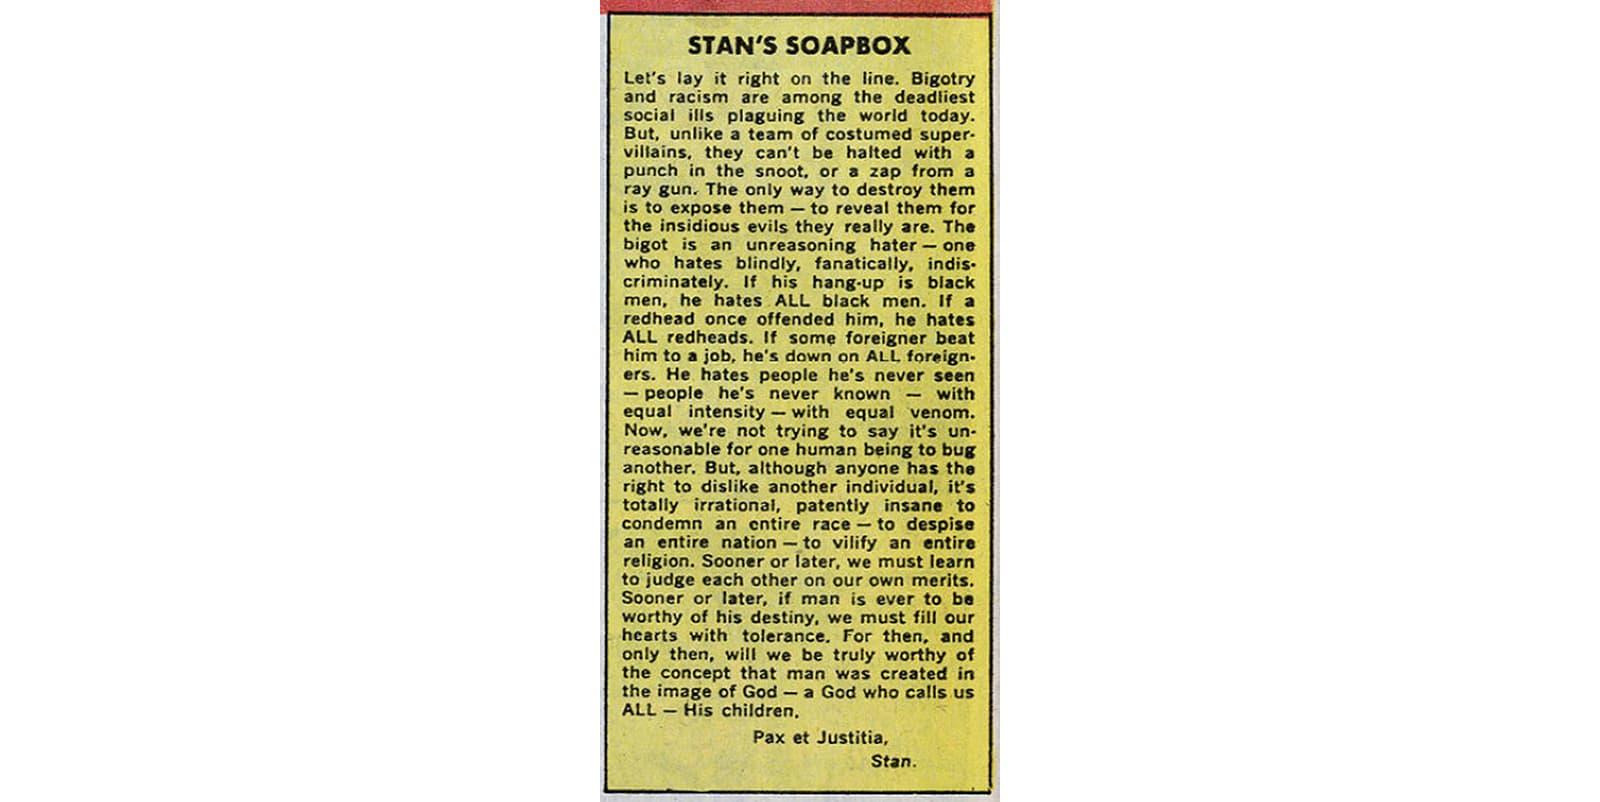 Stan's Soapbox 1968